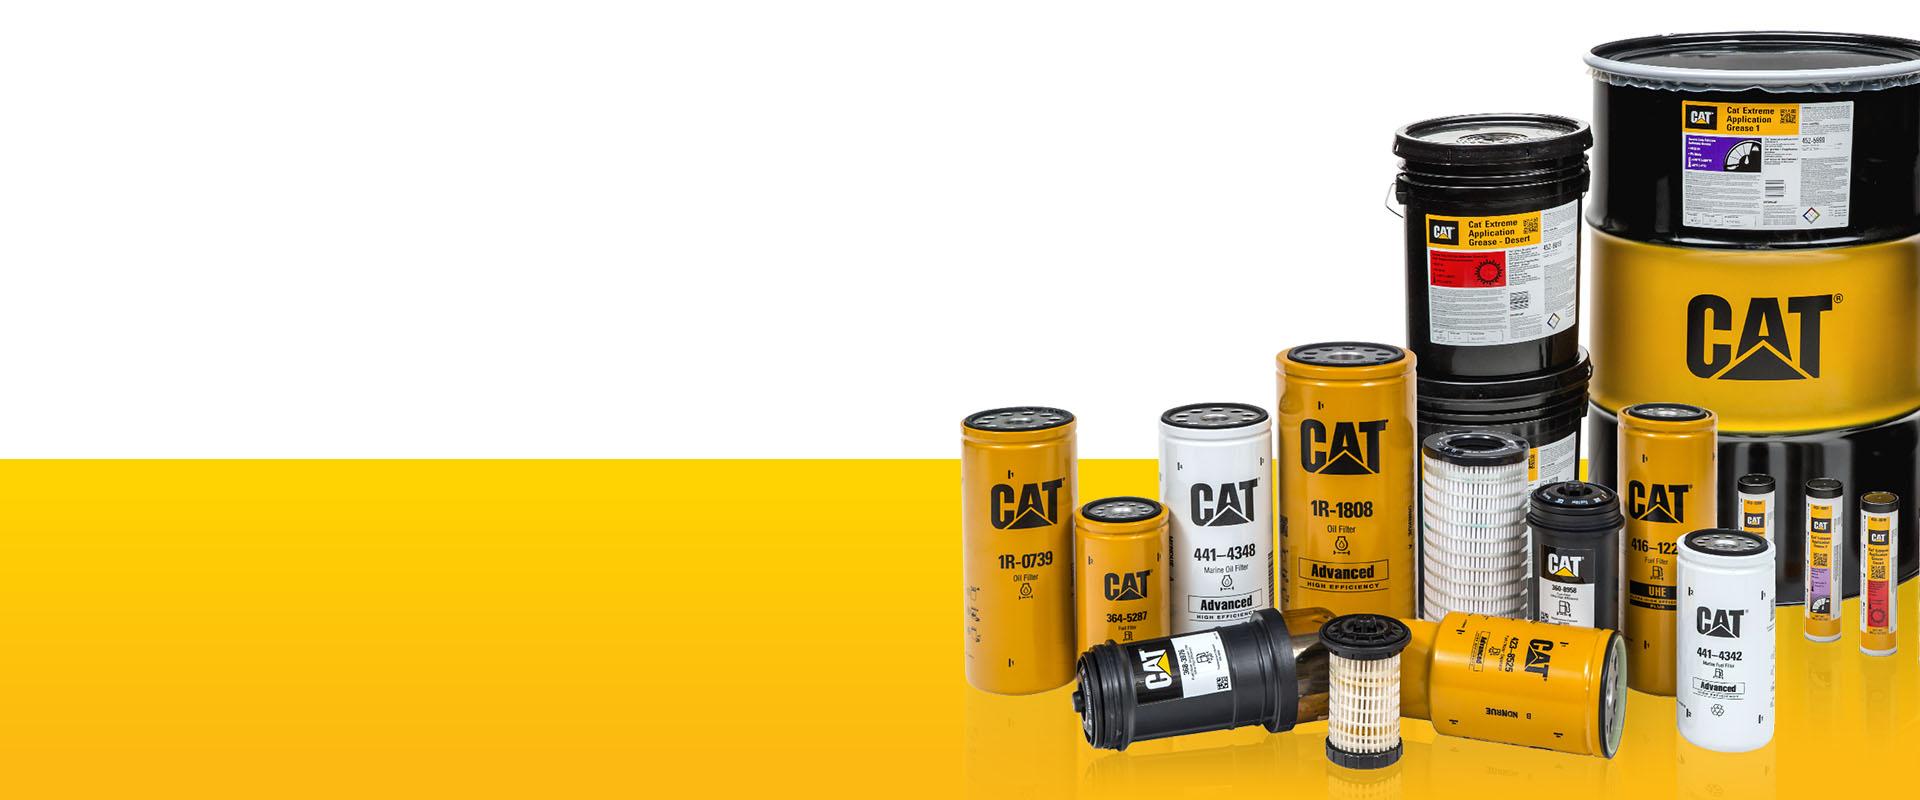 Oil-filter-cat-15-off